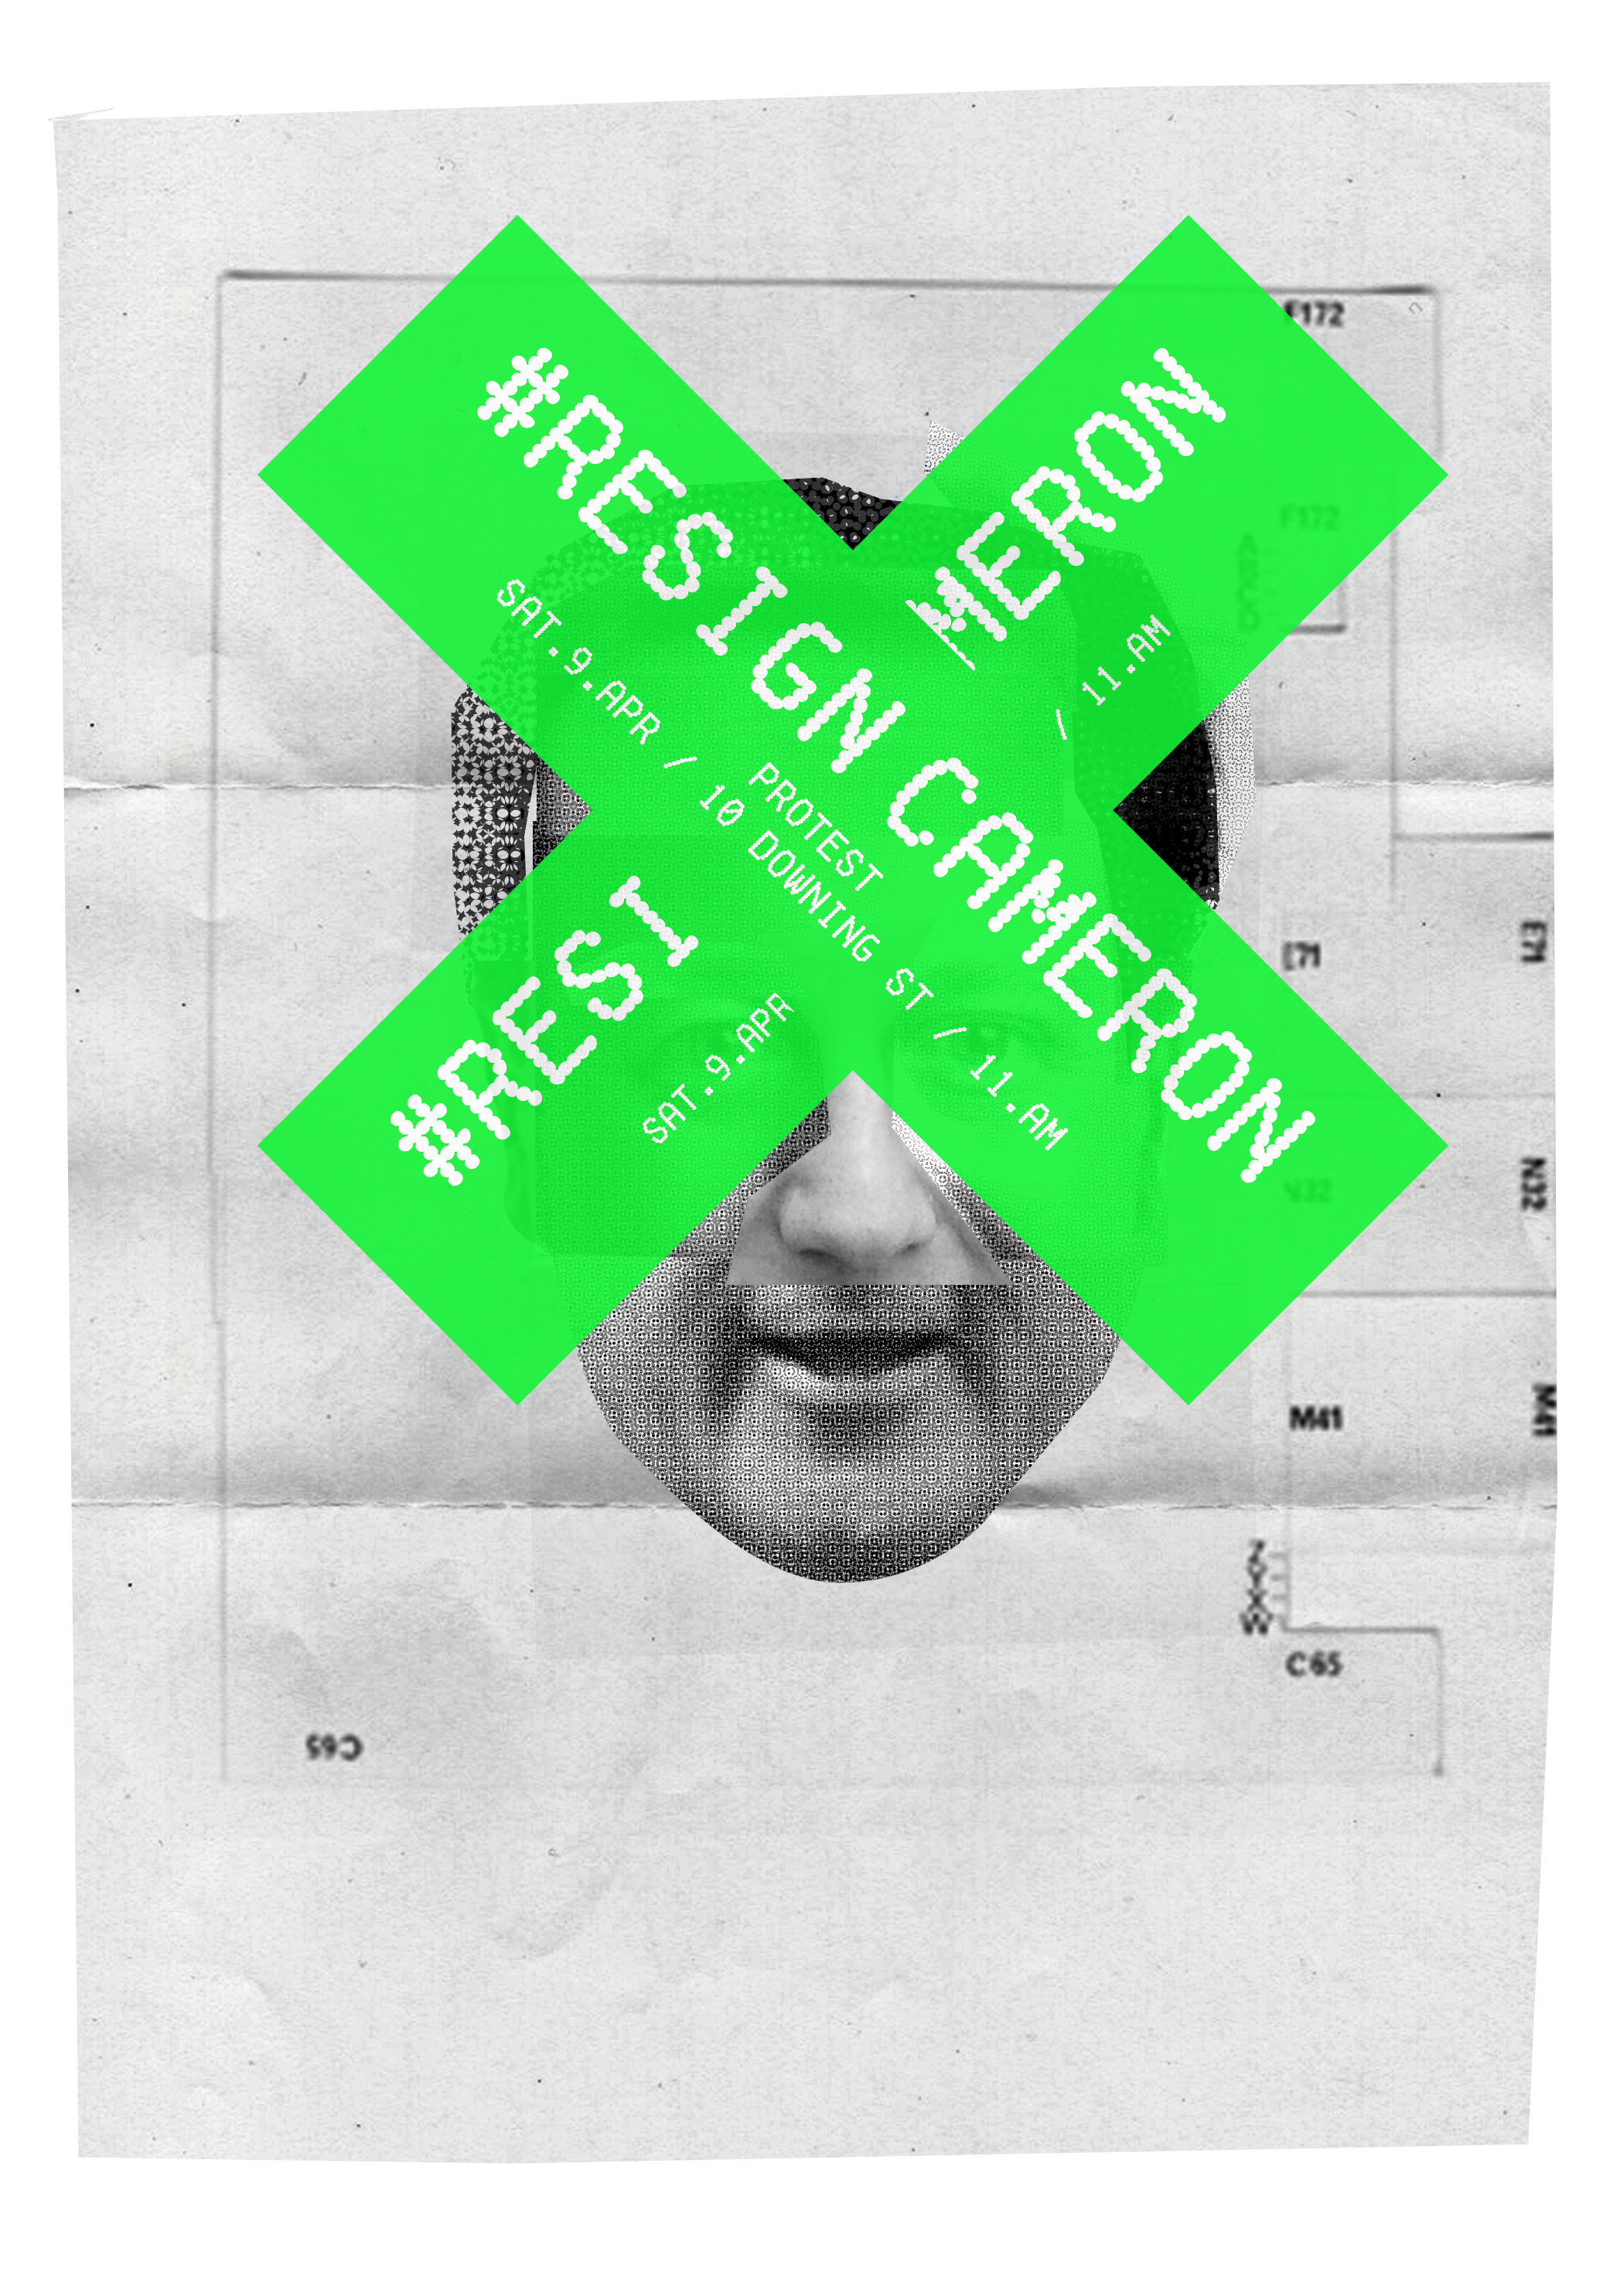 RESIGNCAMERON-green2.jpg